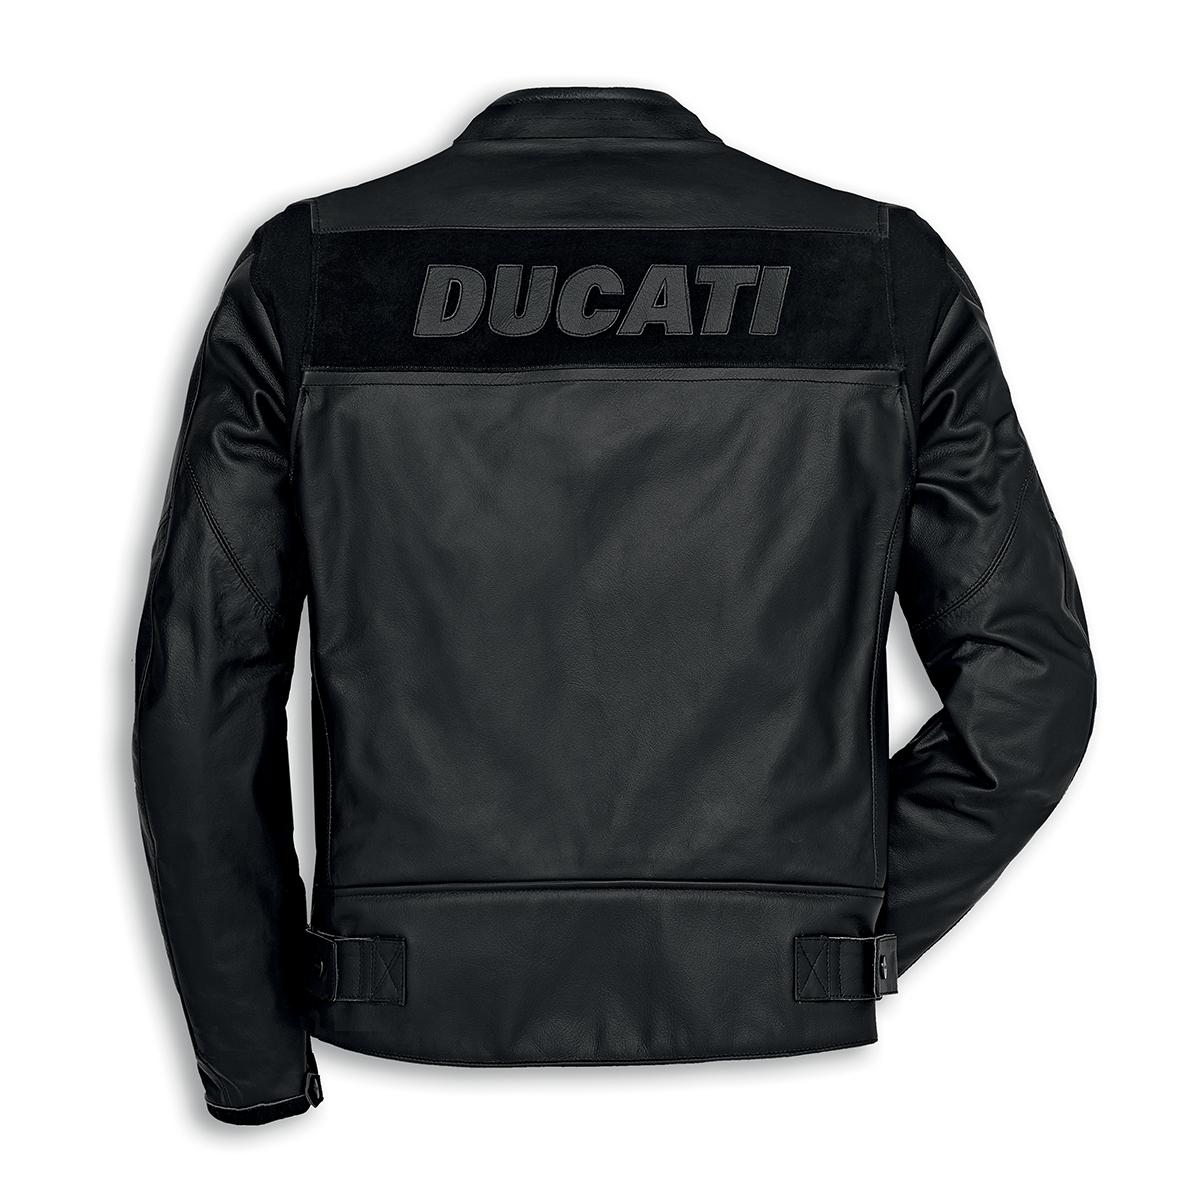 Ducati Diavel Jacket